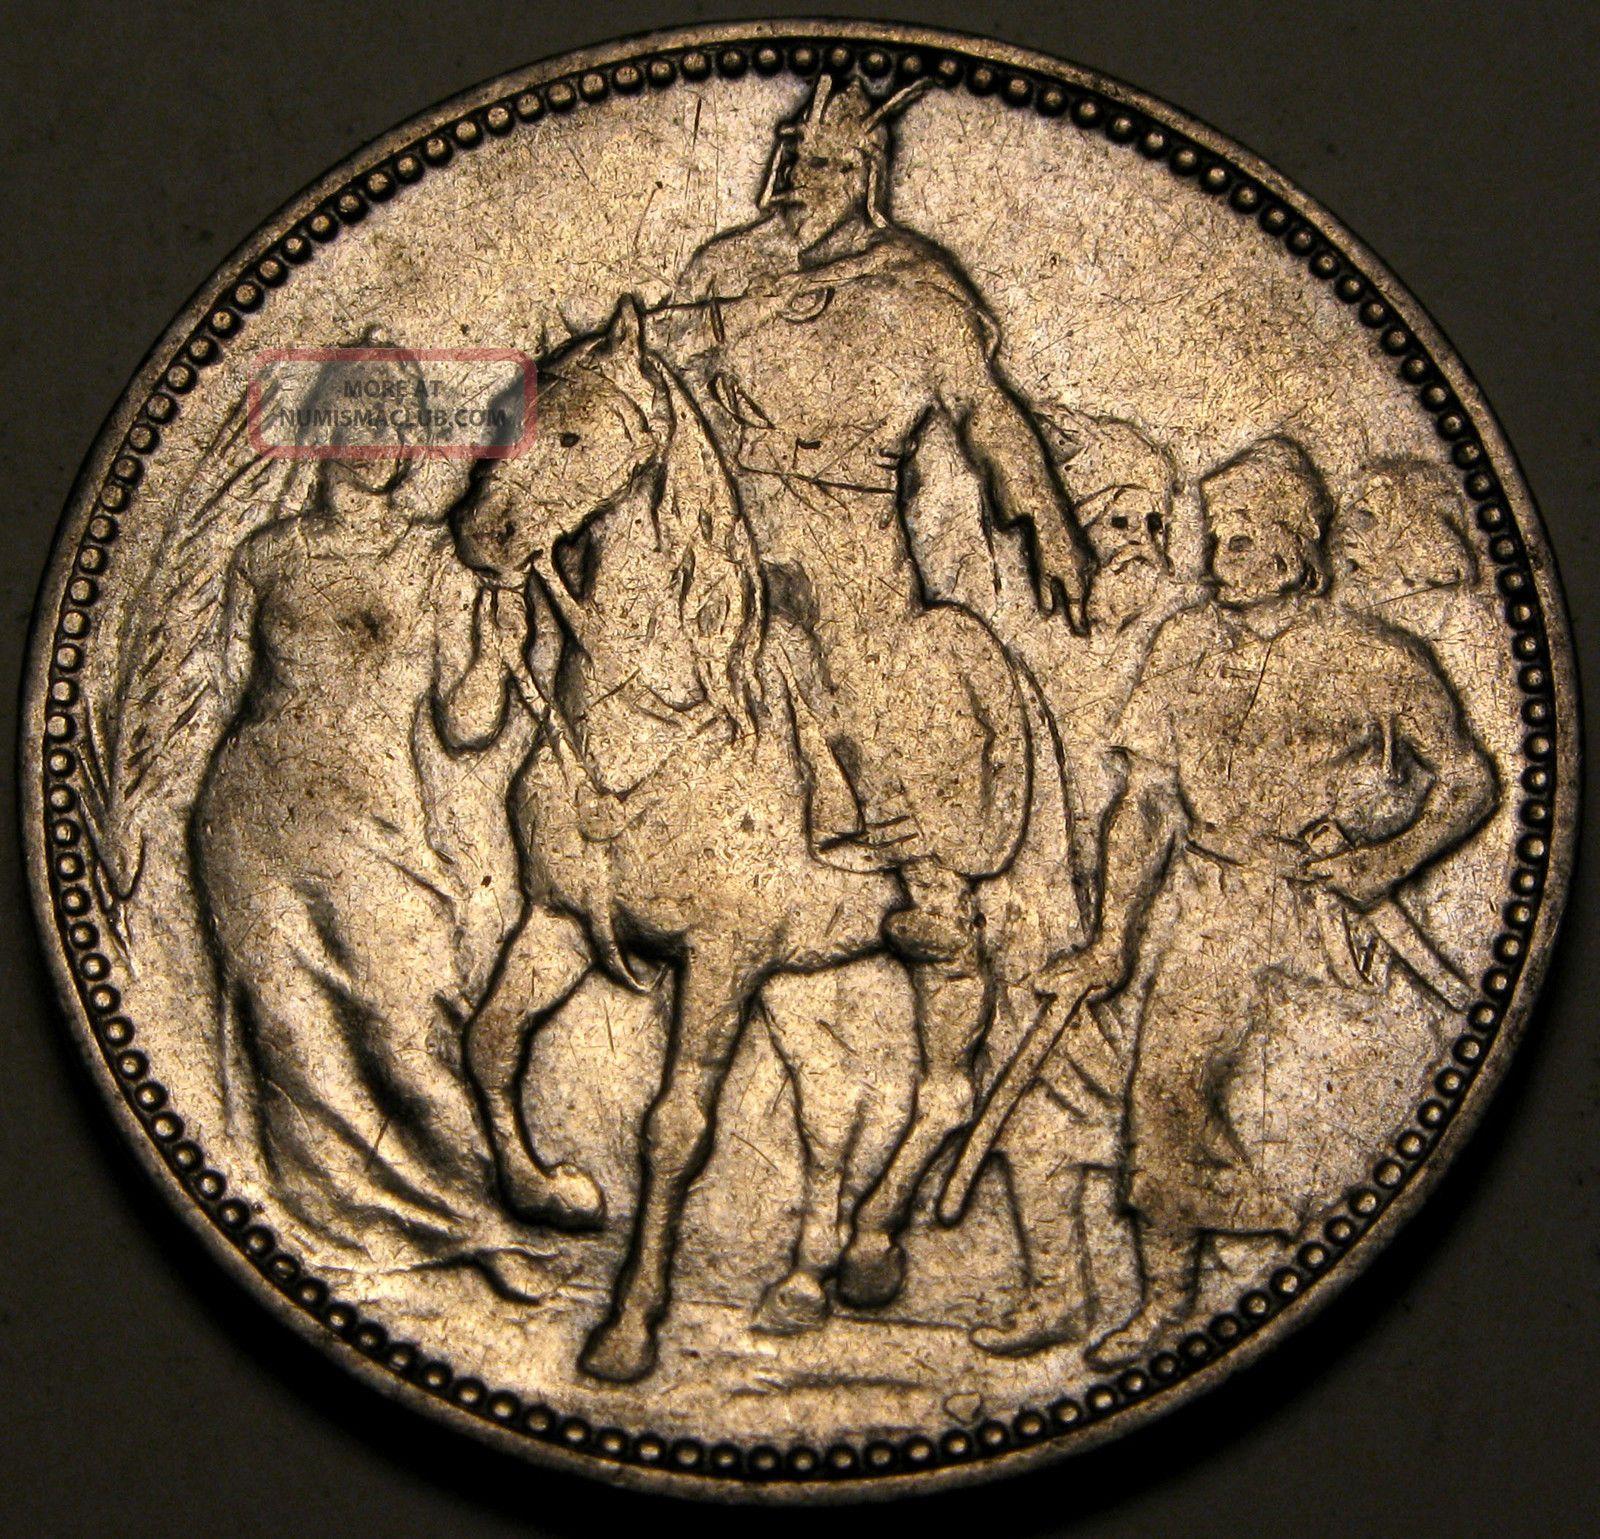 Hungary 1 Korona 1896 - Silver - Millennium Commemorative - Franz Joseph I.  - 2667 Europe photo